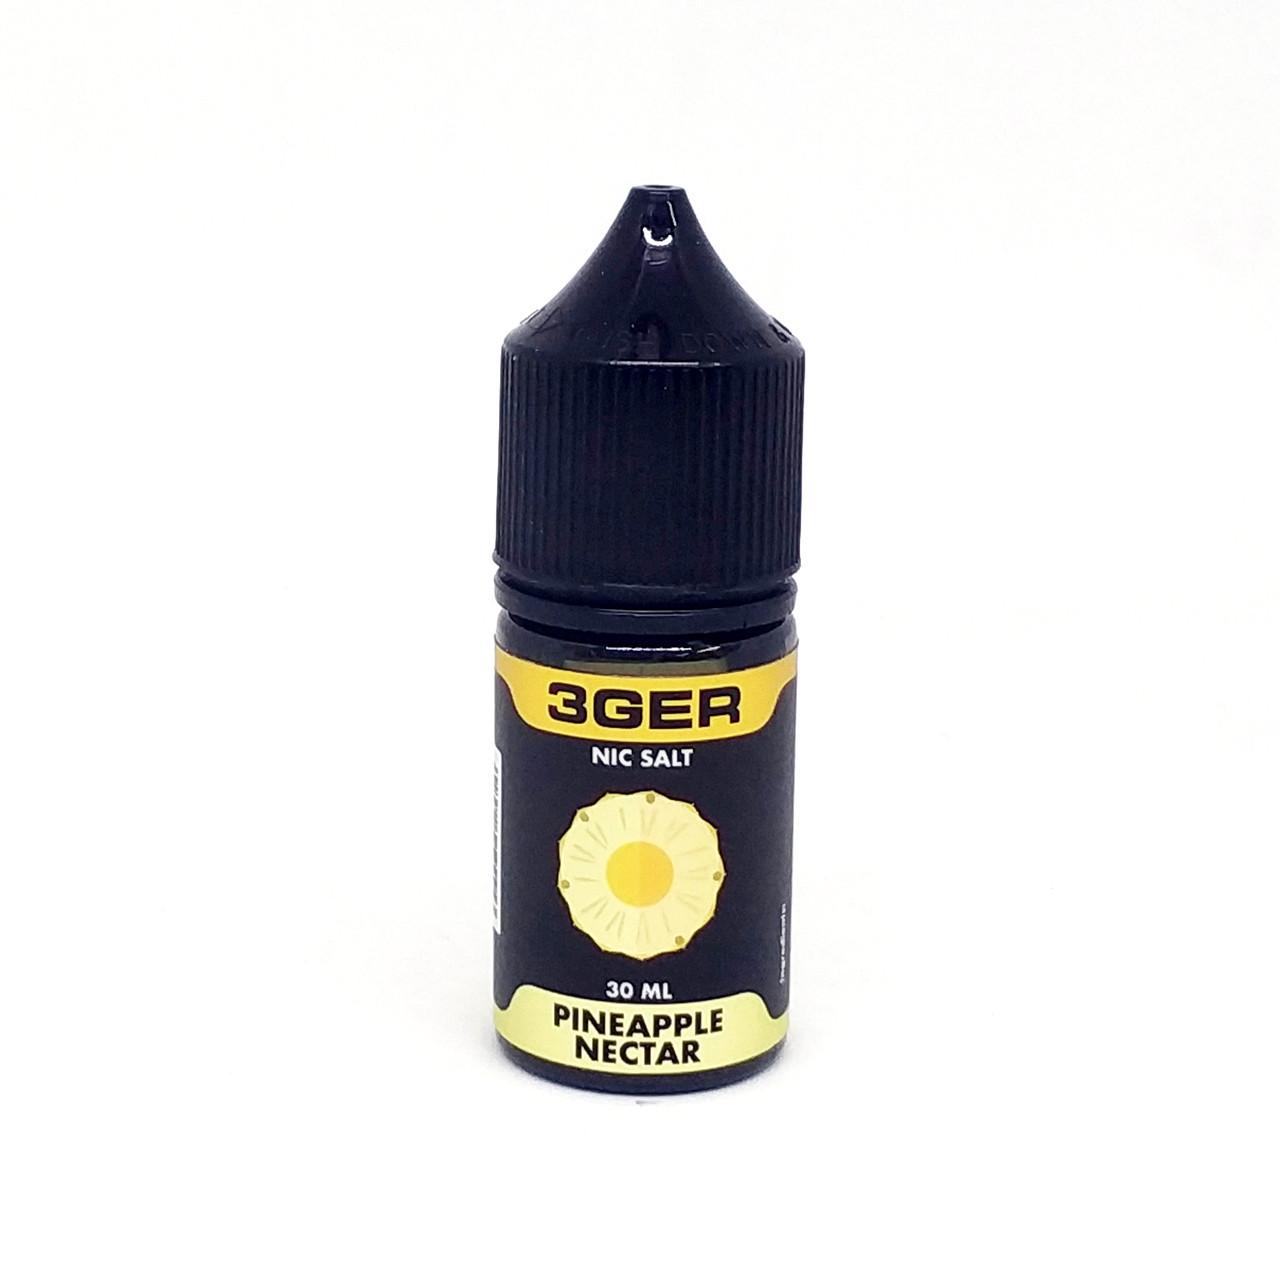 Жидкость для электронных сигарет 3Ger Salt Pineapple Nectar 50 мг 30 мл